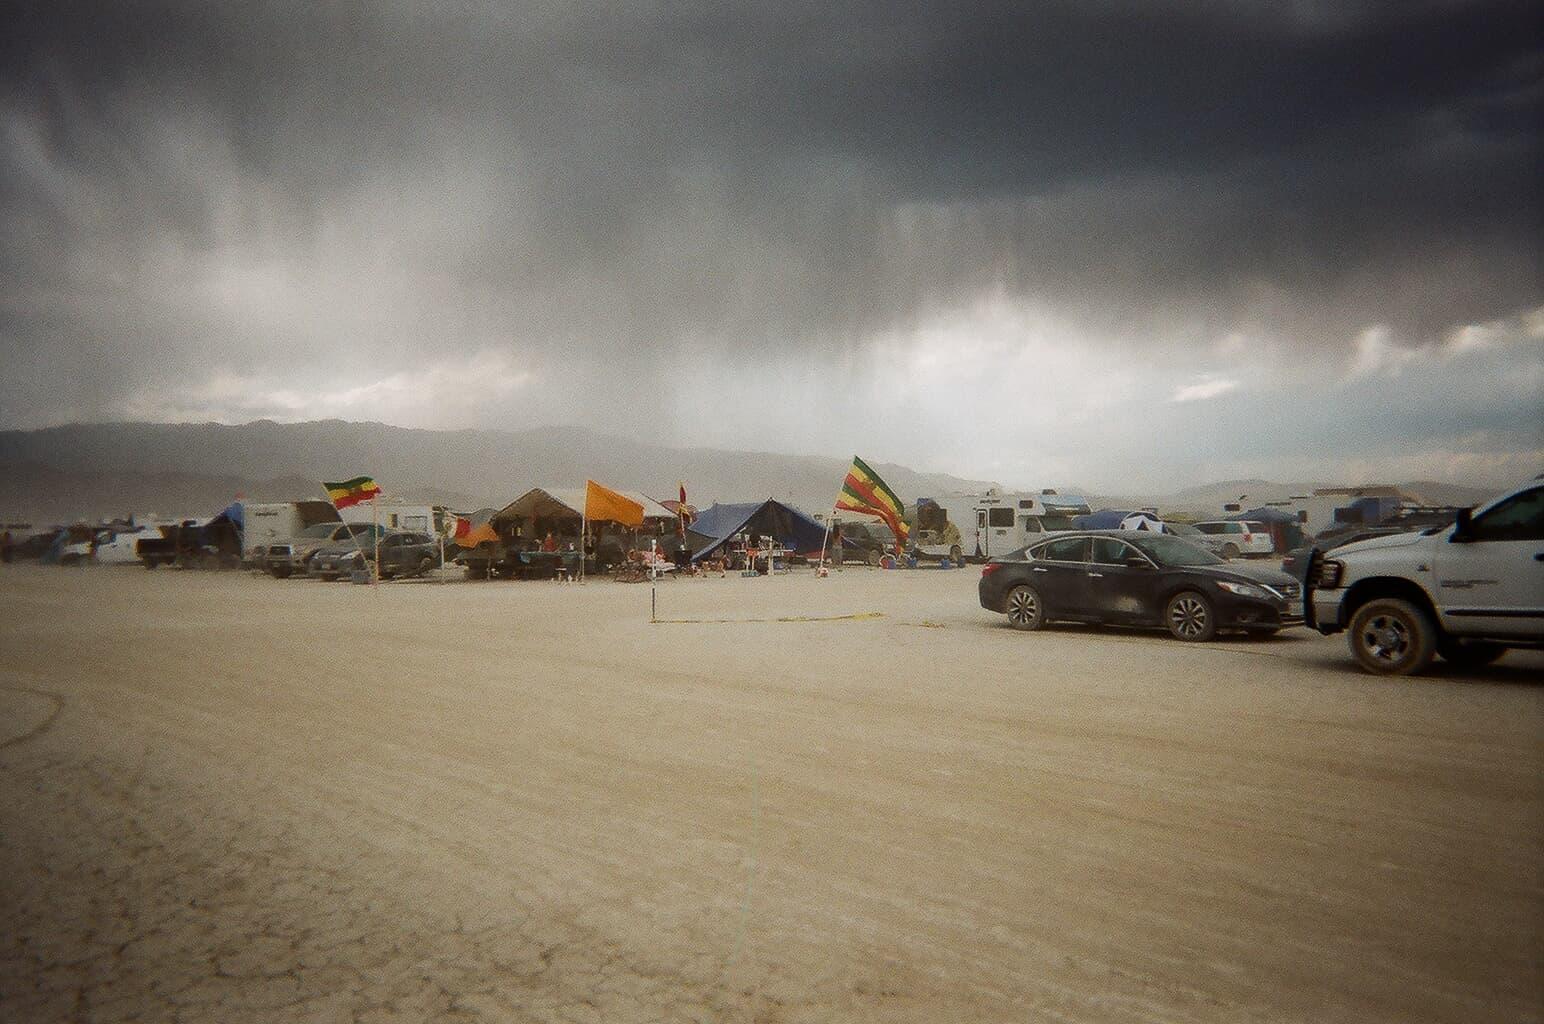 Gorilla Hut Design: storm resistance